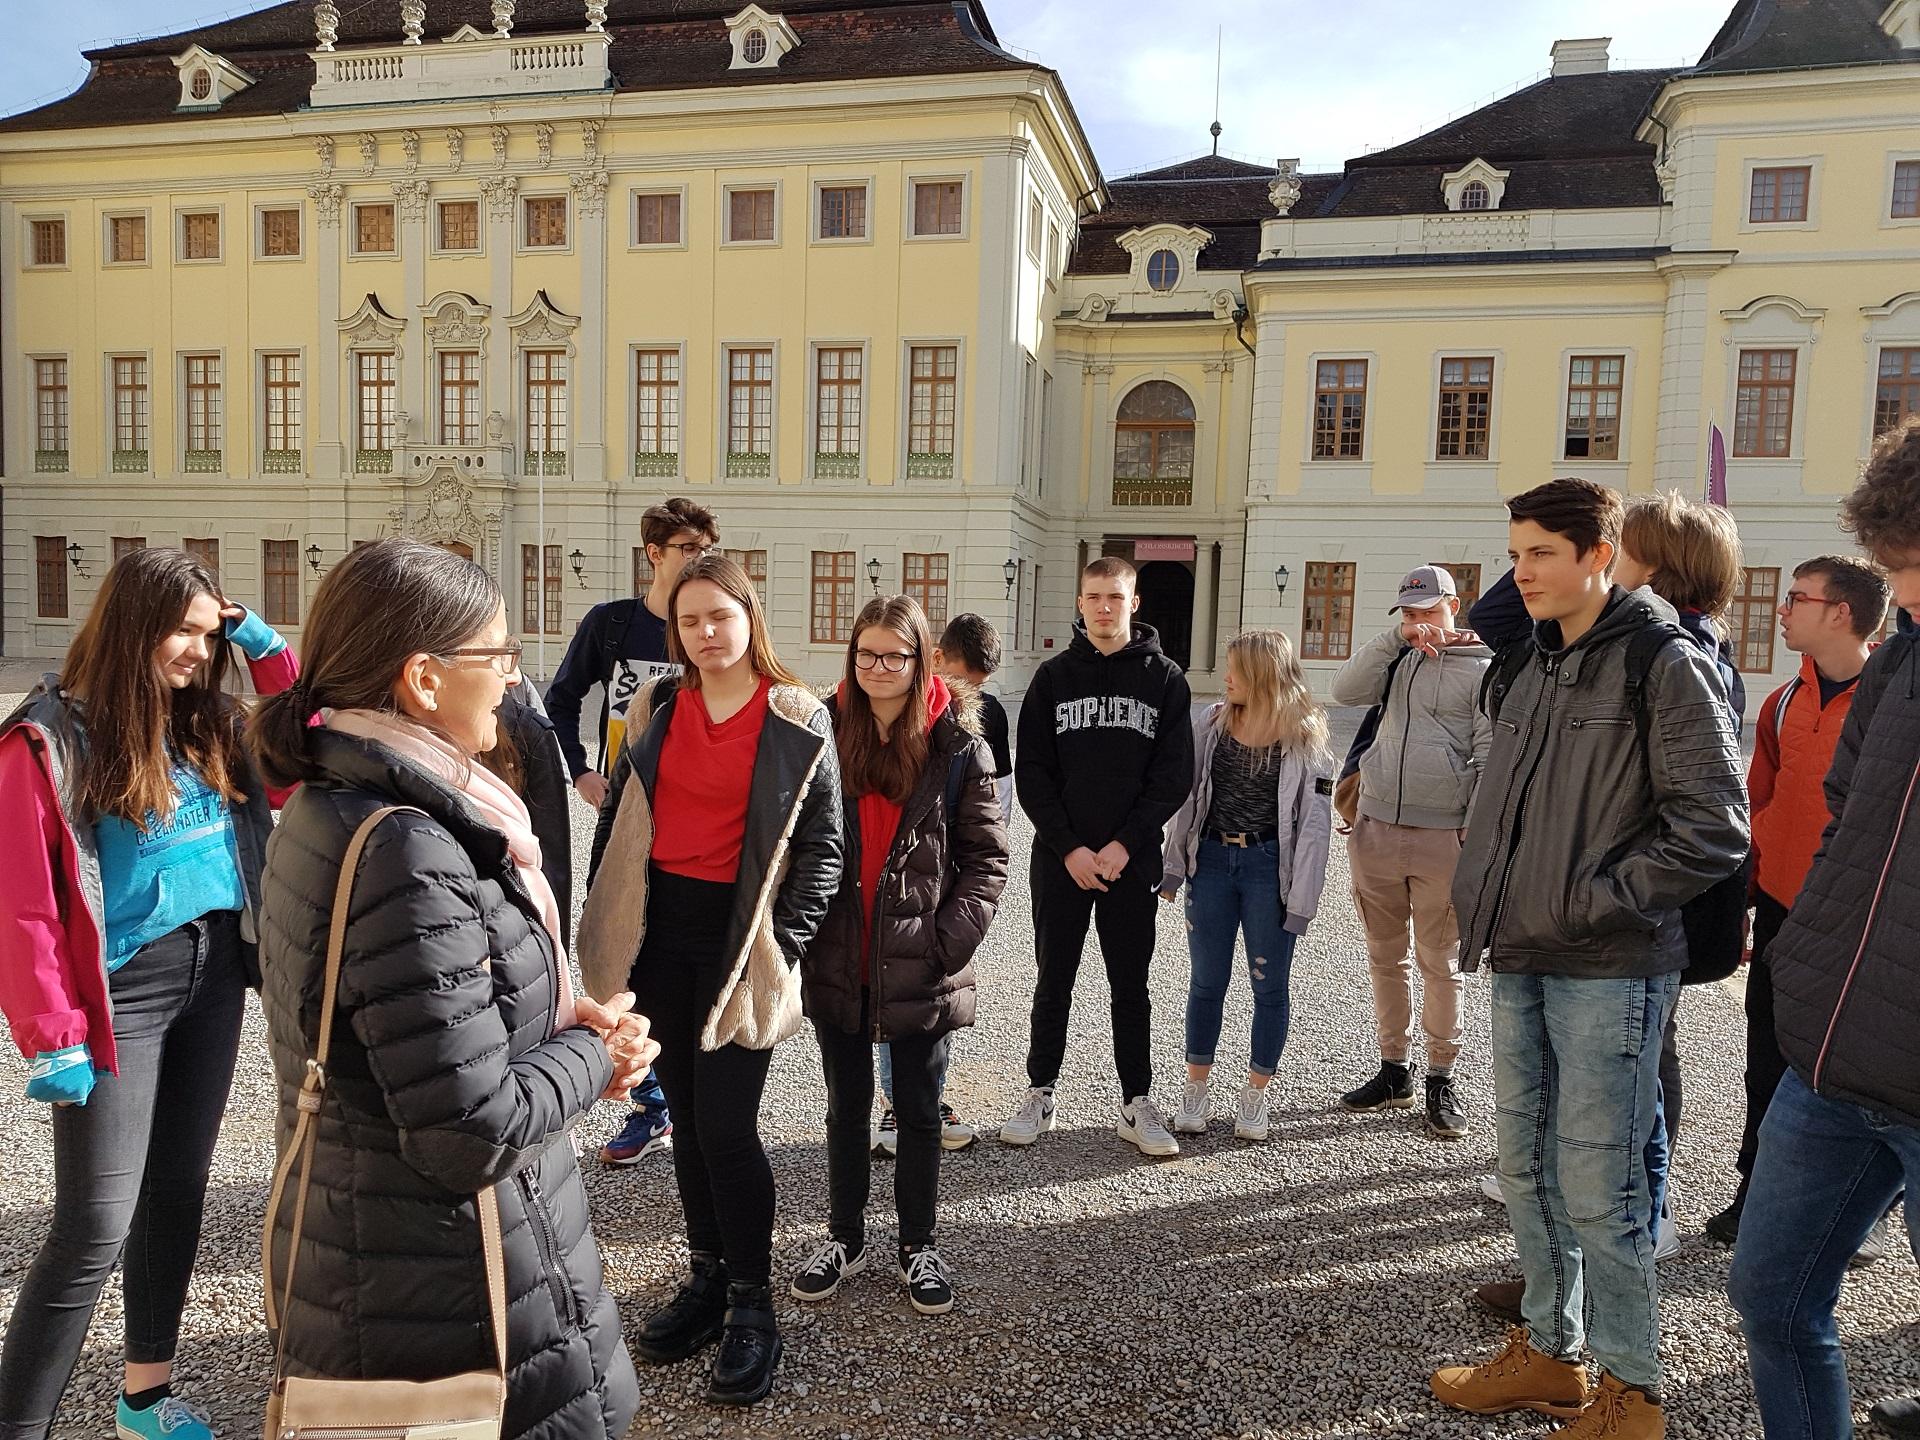 Auf ins Residenzschloss Ludwigsburg